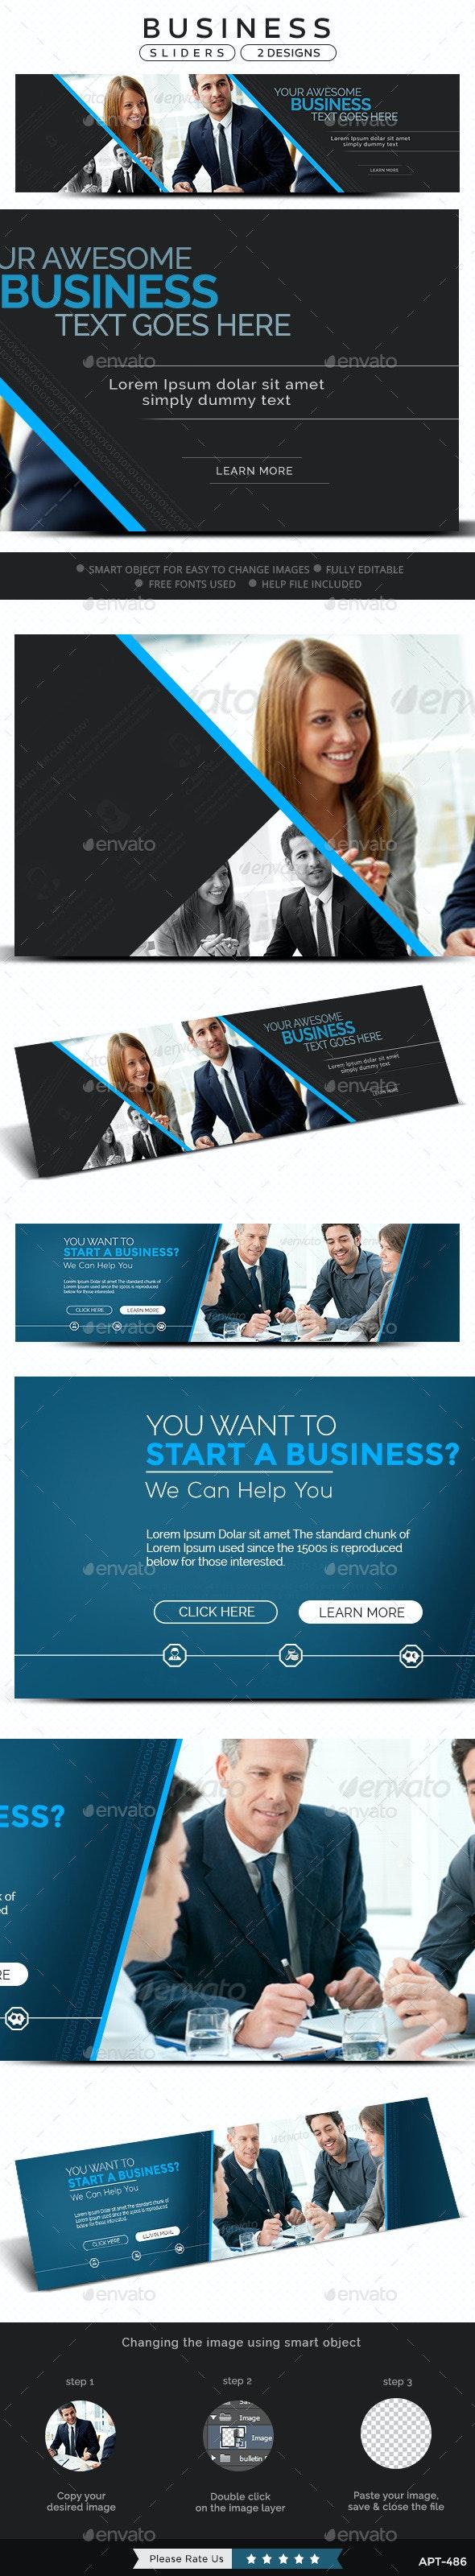 Business Sliders - 2 Designs - Sliders & Features Web Elements